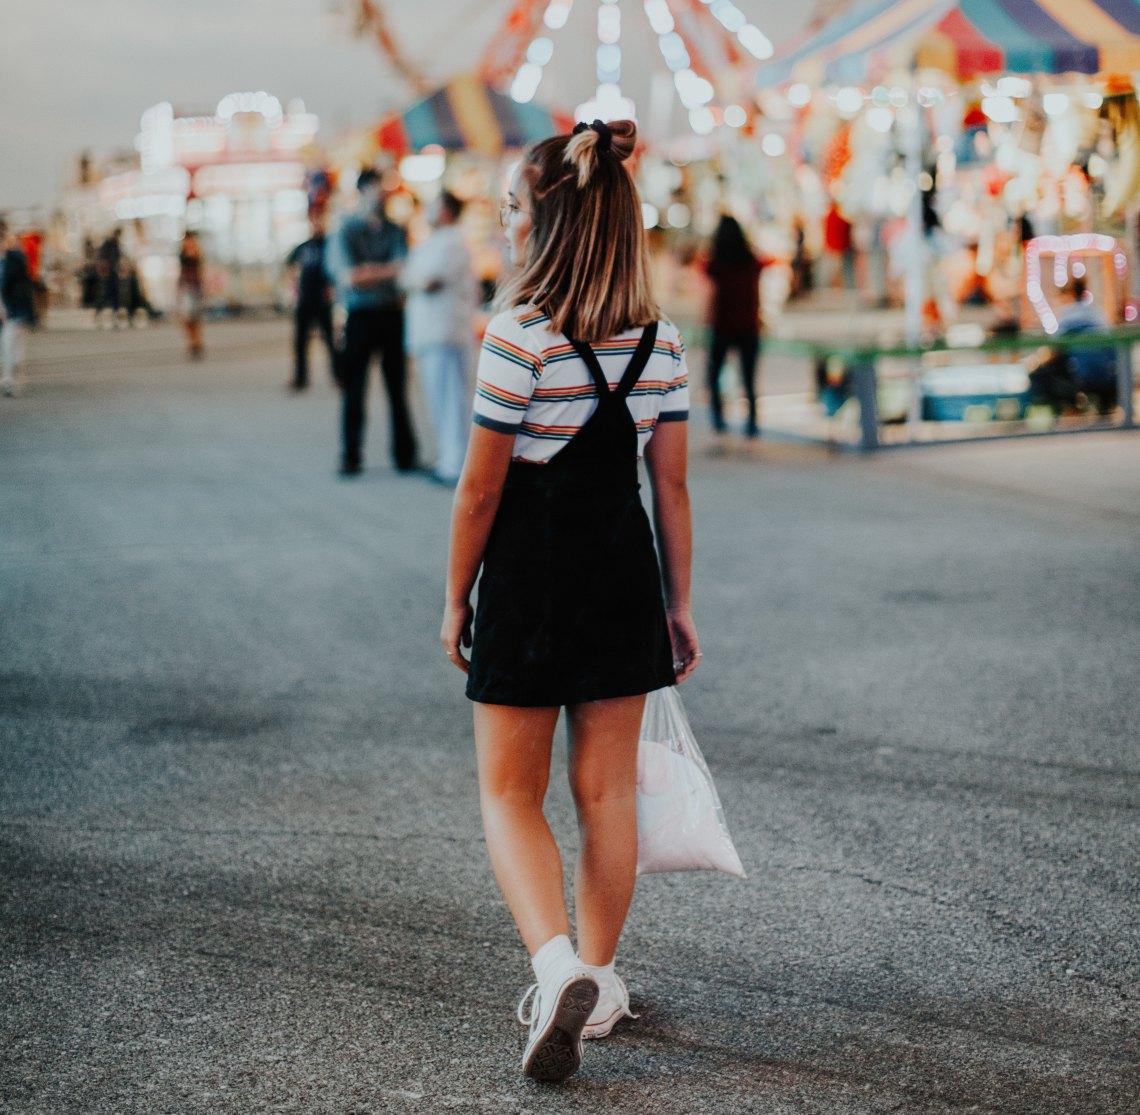 girl at fair